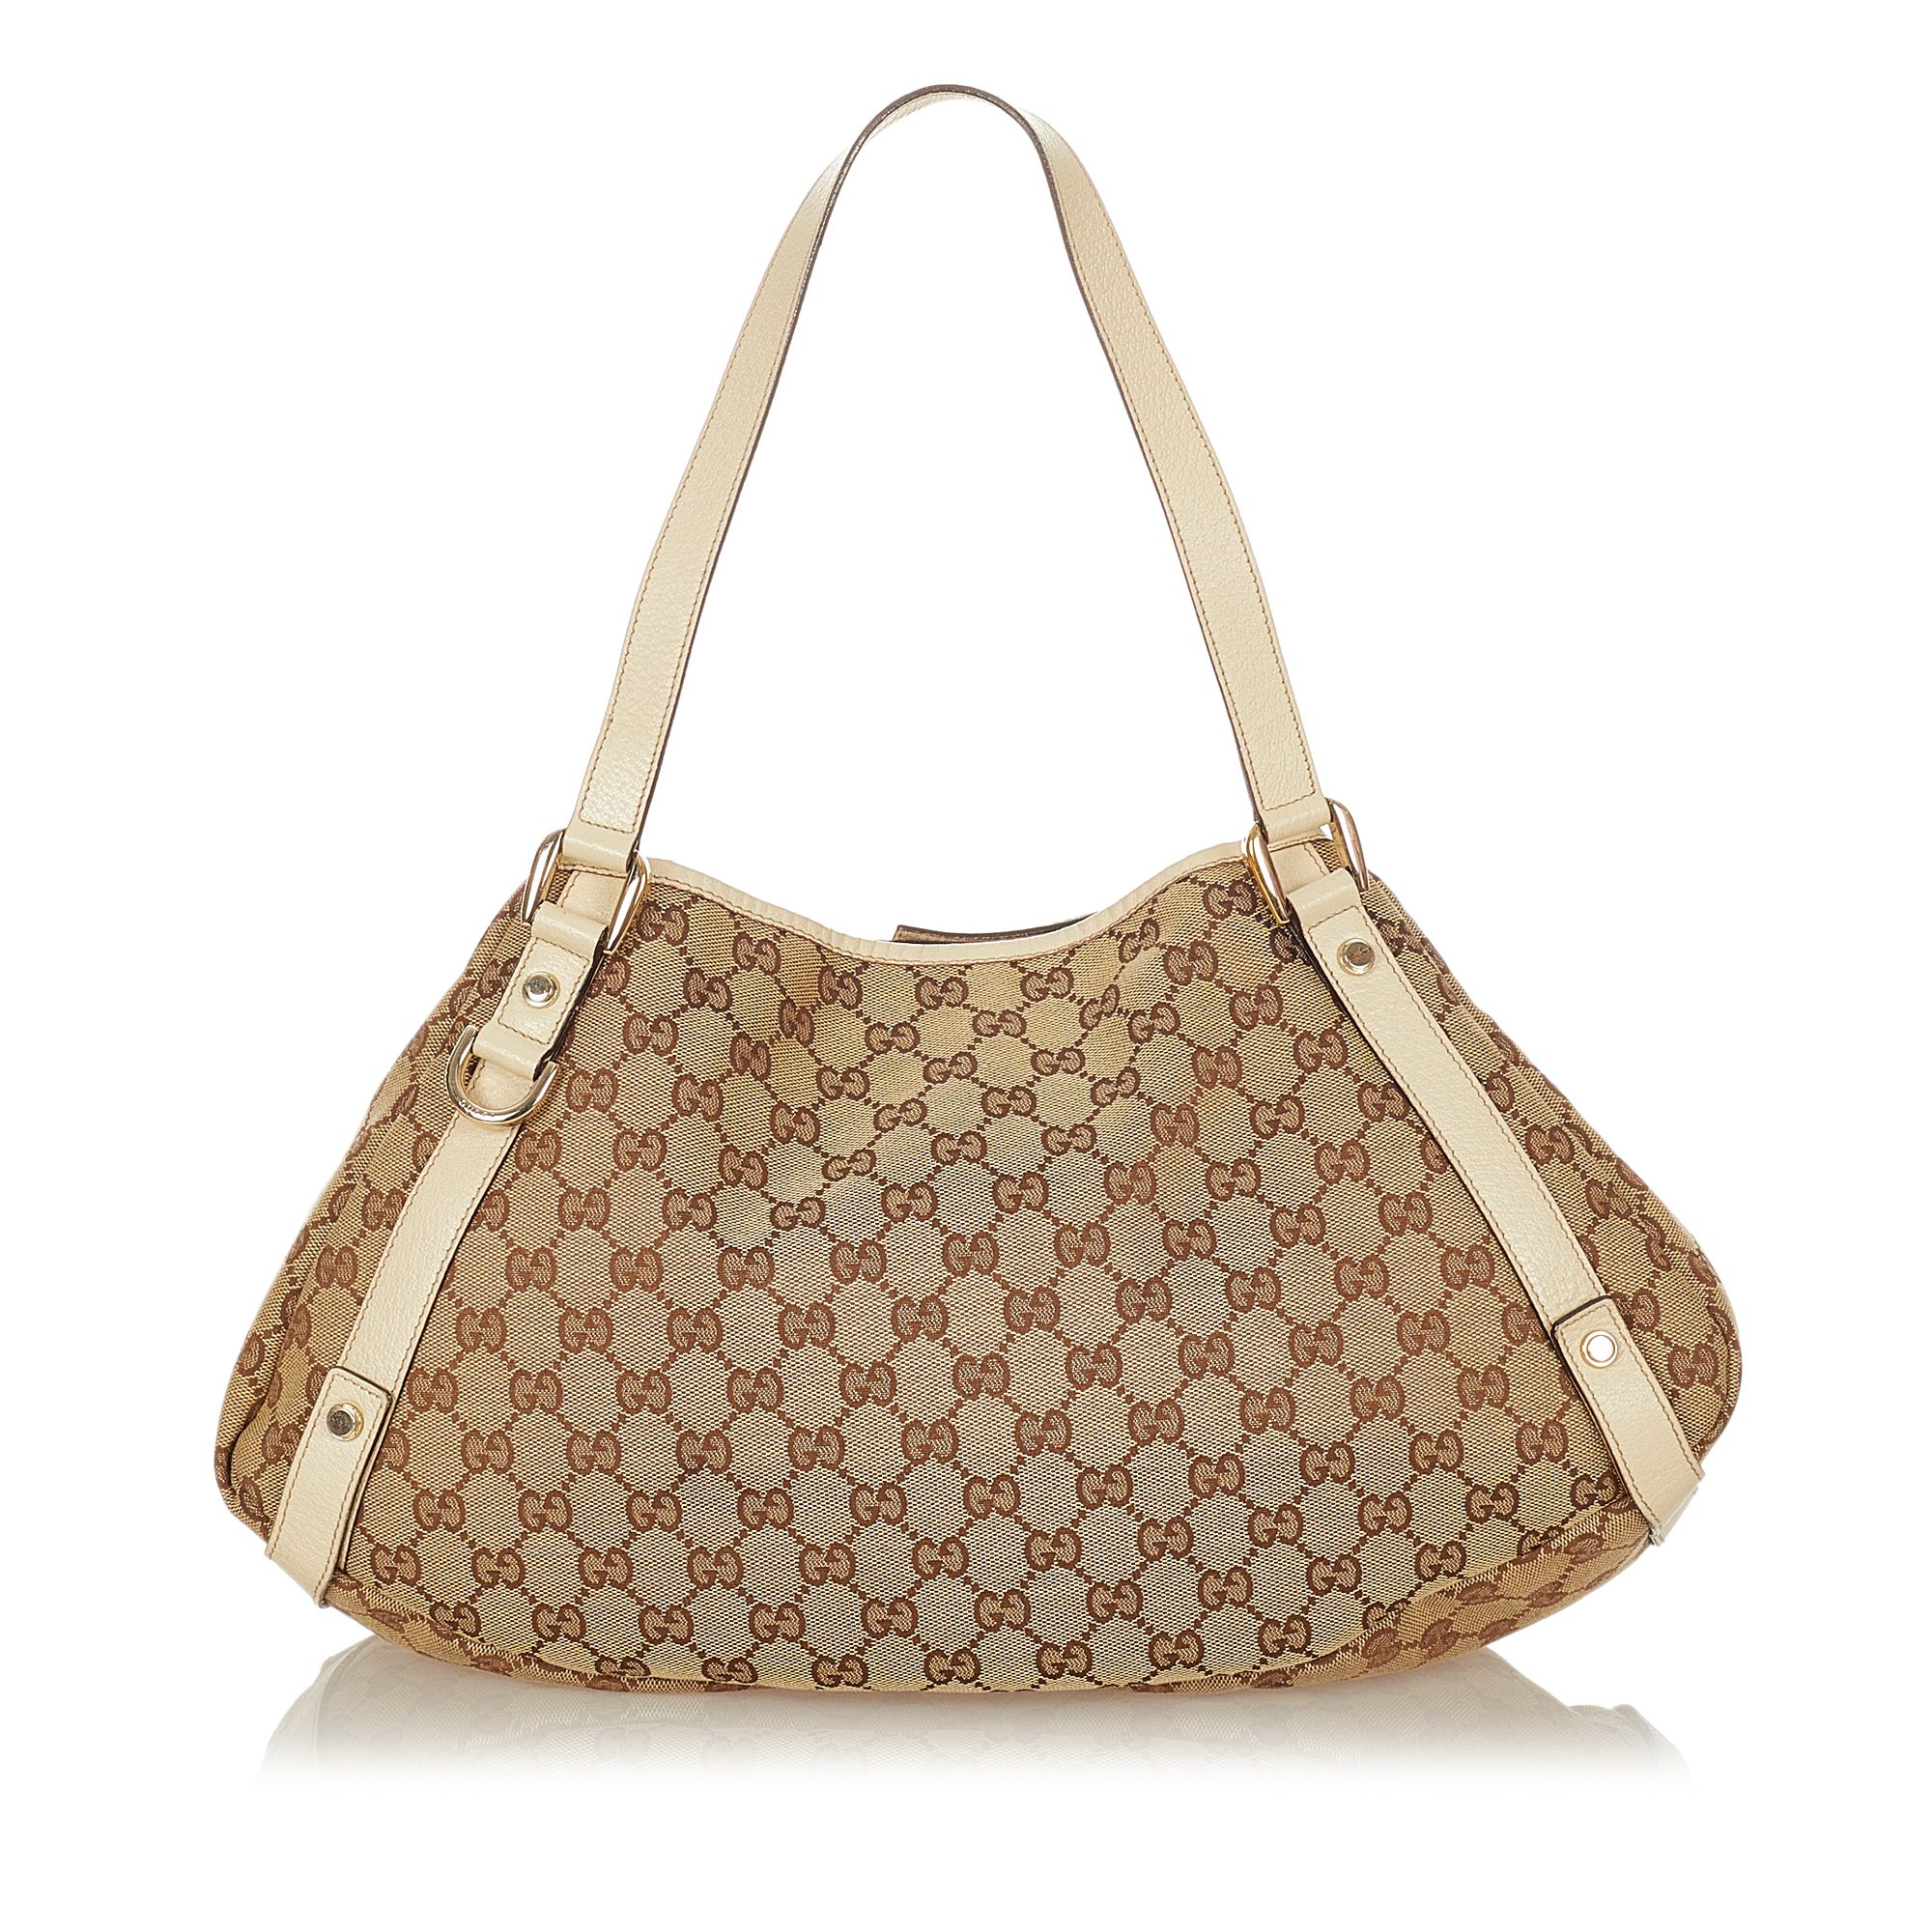 Vintage Gucci GG Canvas Pelham Tote Bag Brown